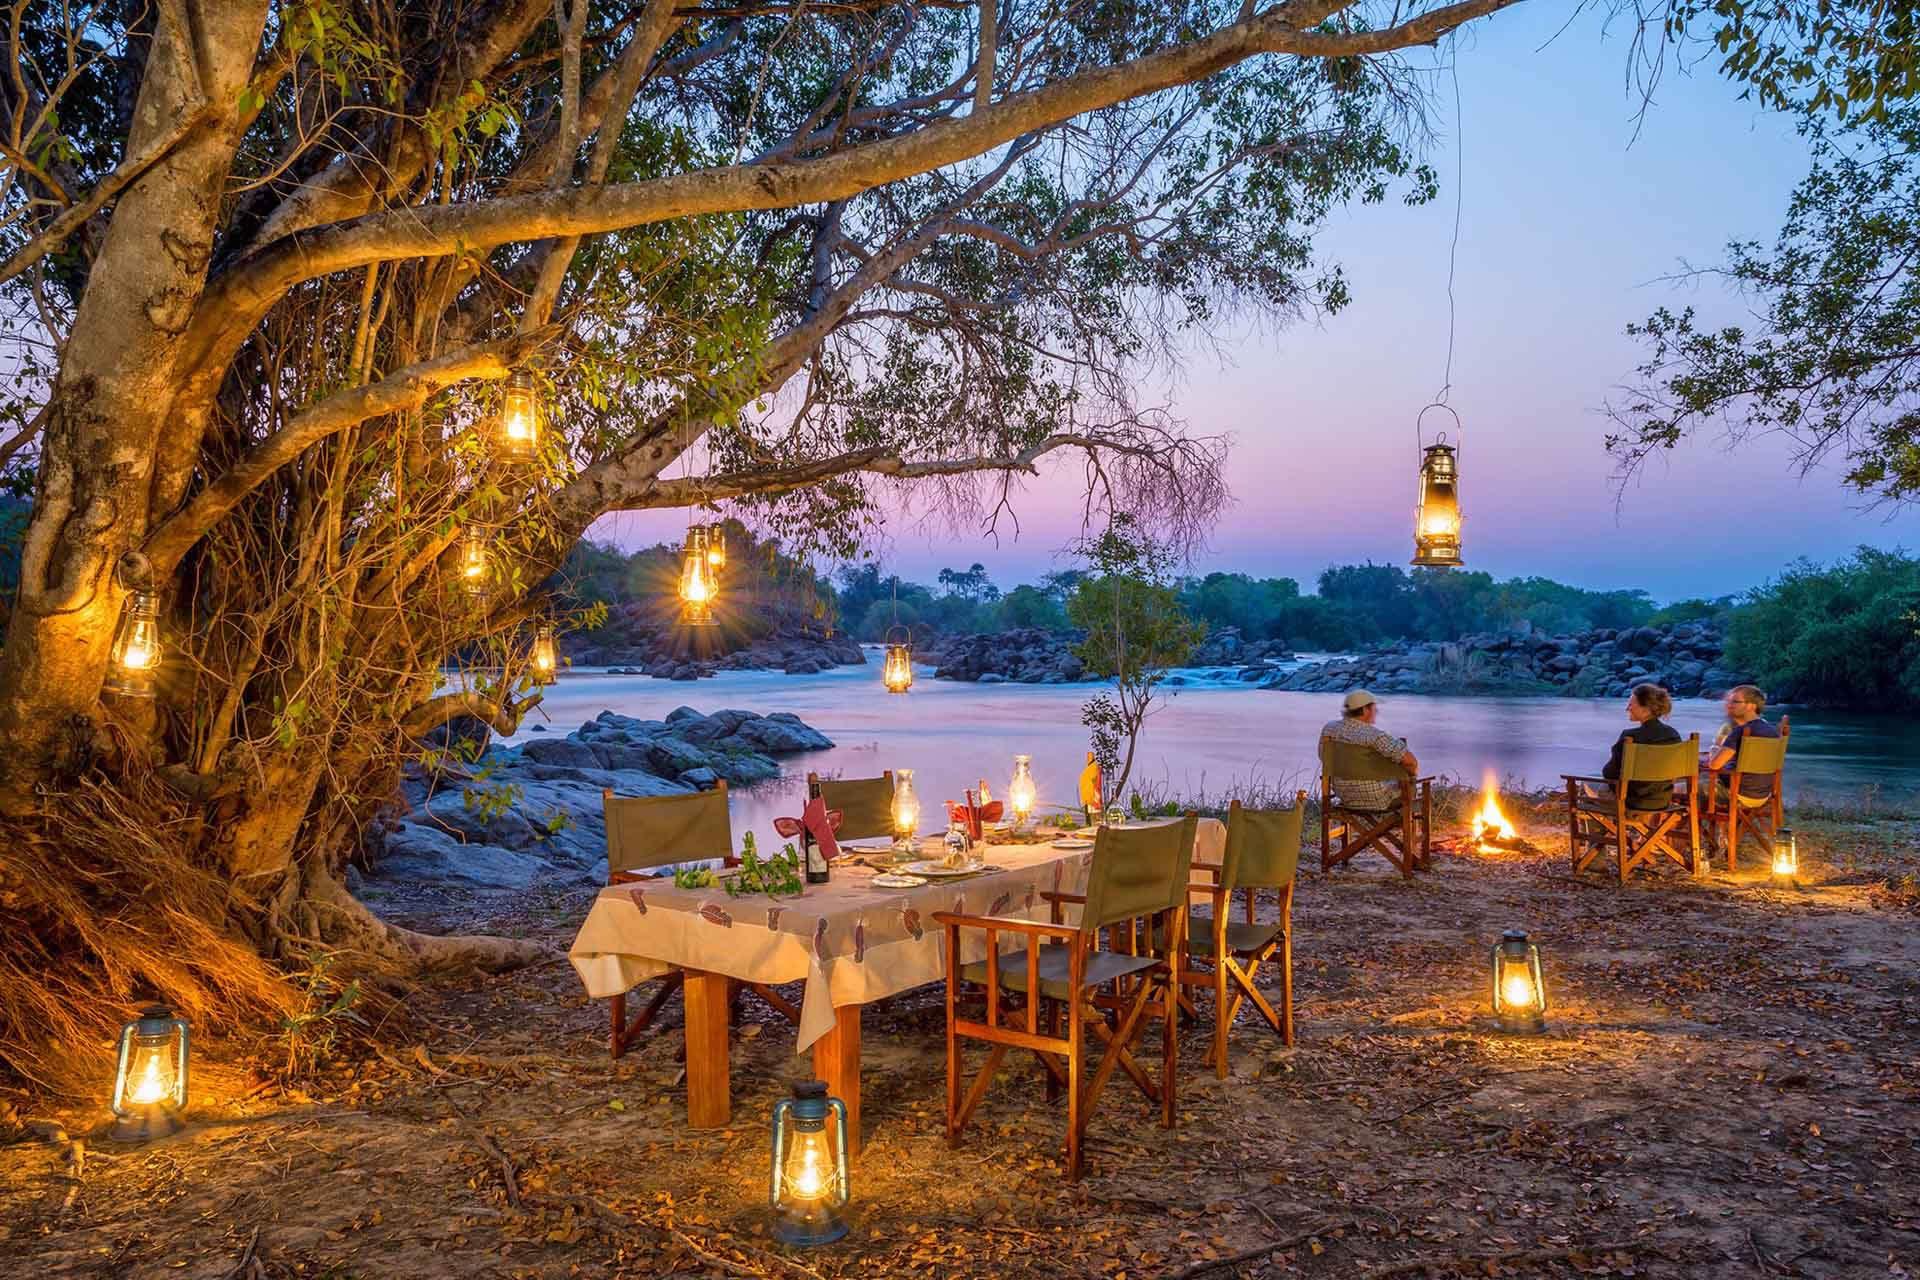 Kaingu Safari Camp on the Kafue River